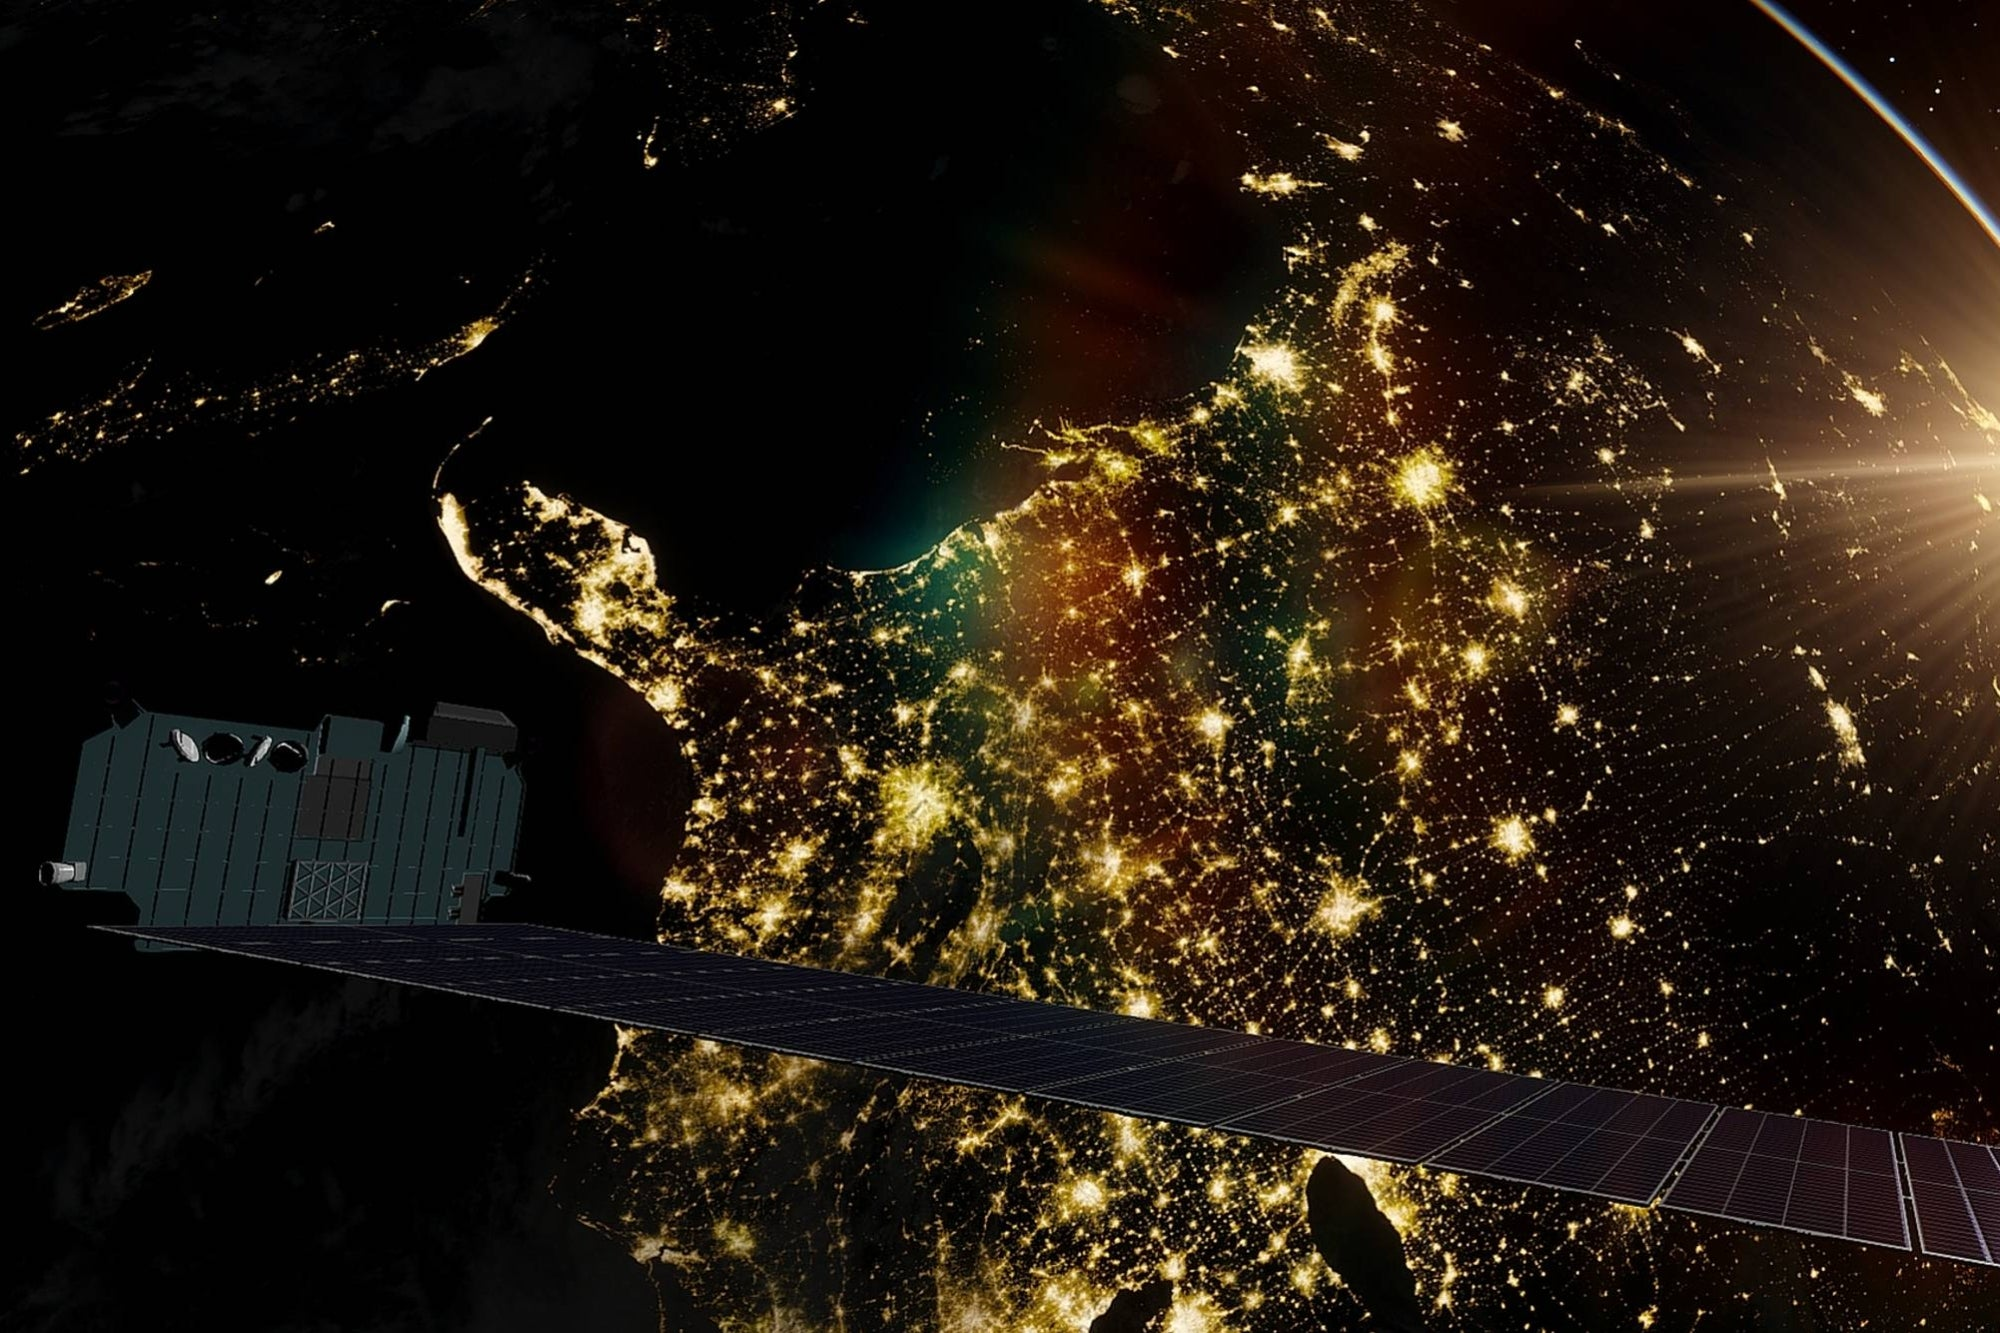 Elon Musk Starlink's internet will be 40% faster than the speed of light on fiber optics: Elon Musk thumbnail